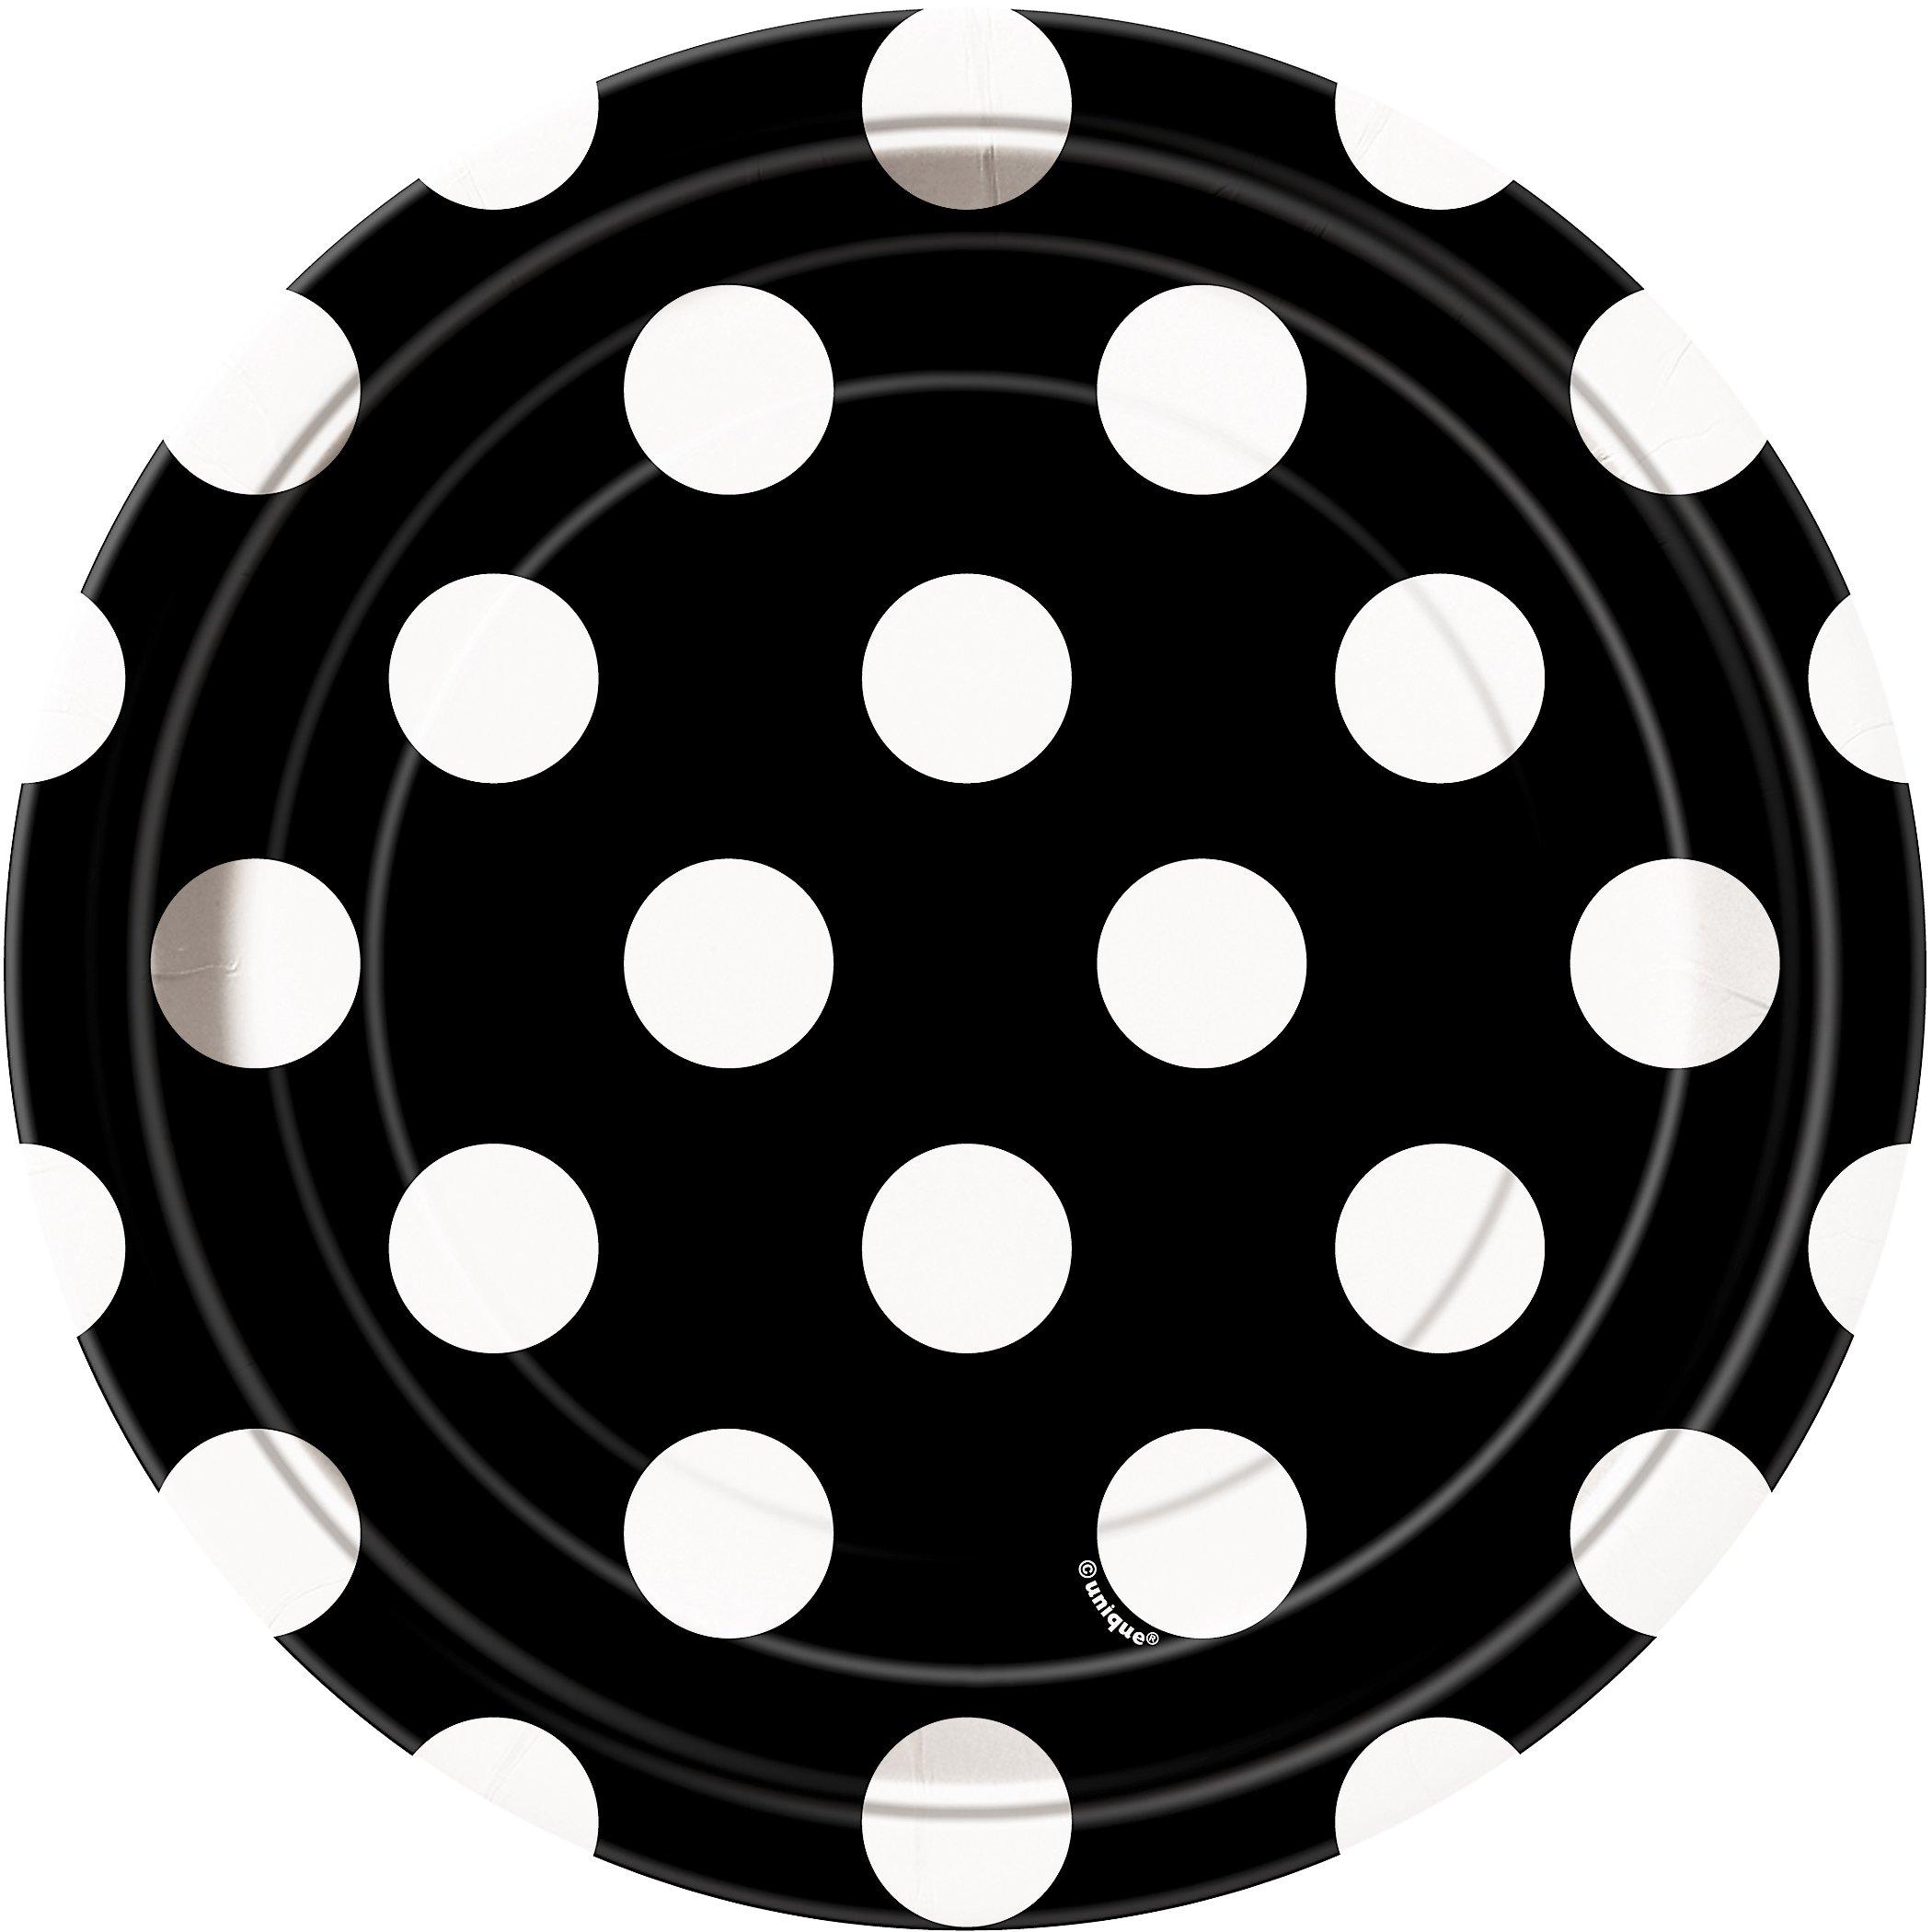 Black Polka Dot Paper Cake Plates, 8ct